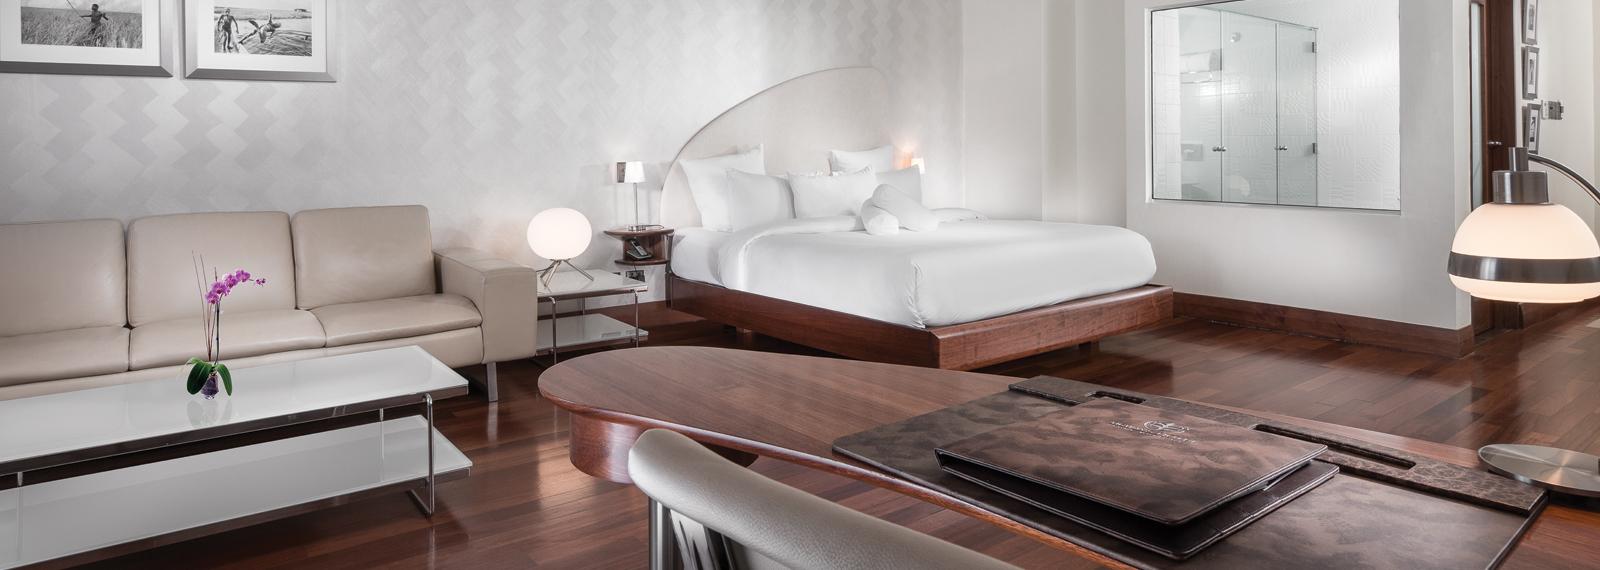 Spacious, luxurious rooms